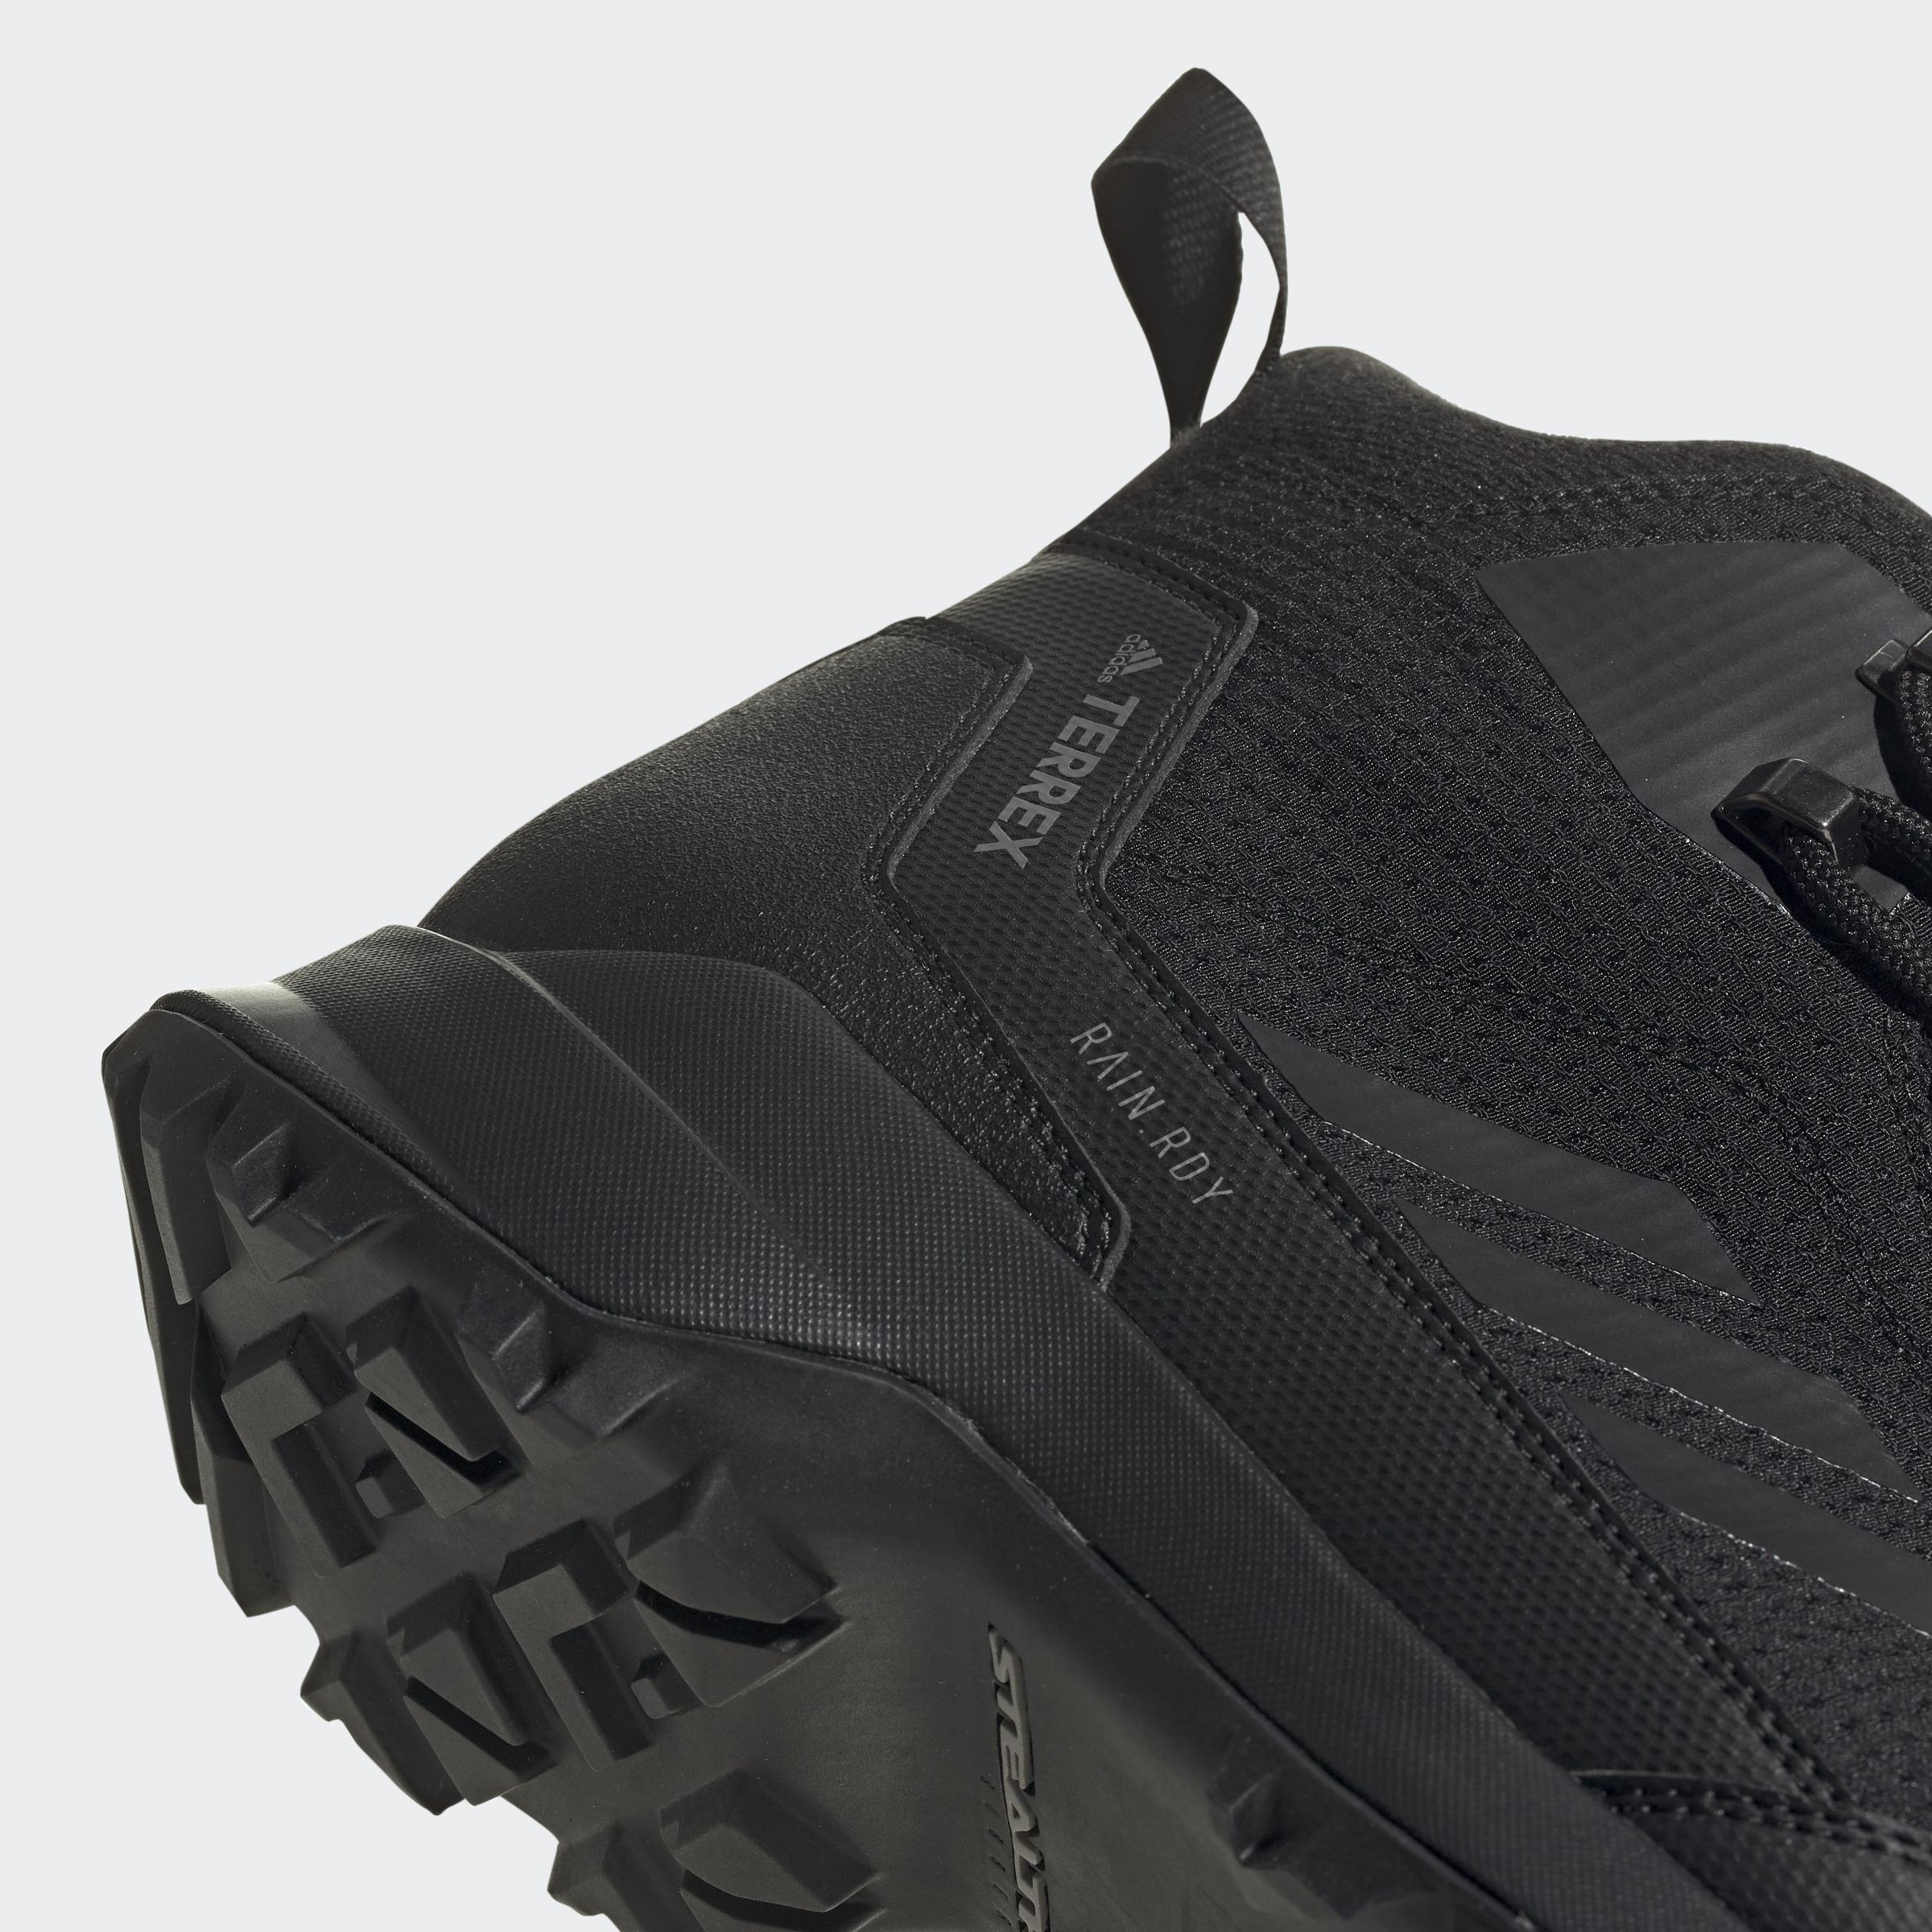 8bc53337927 Terrex Heron Mid CW CP Boots